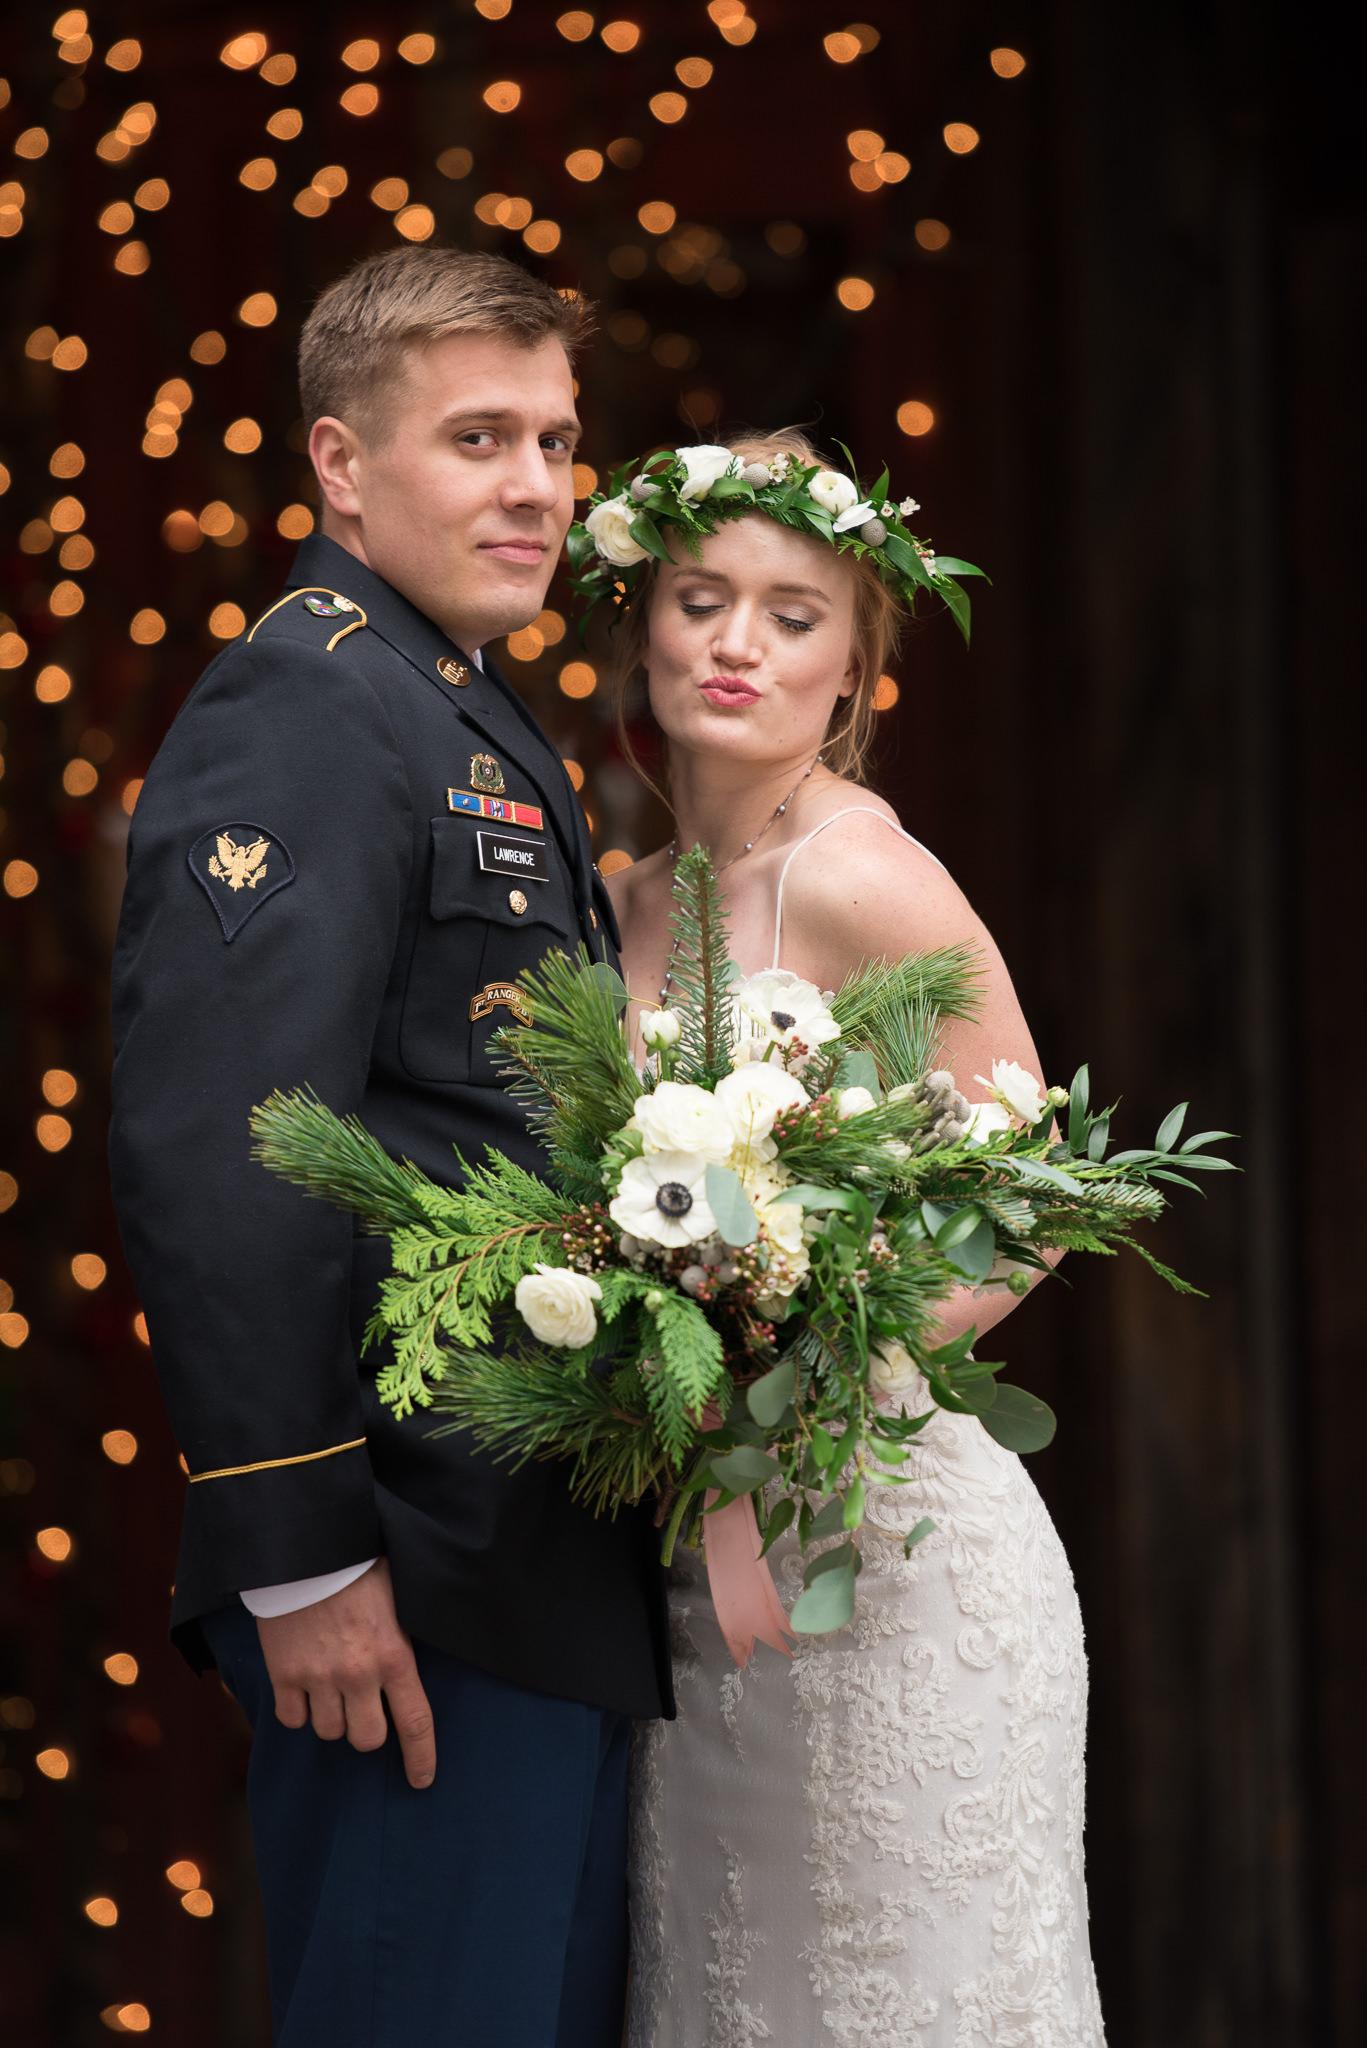 Trevor-Hooper-Wedding-Photographer-The-Bungalow-Wedding-Utah_CLR_023.jpg